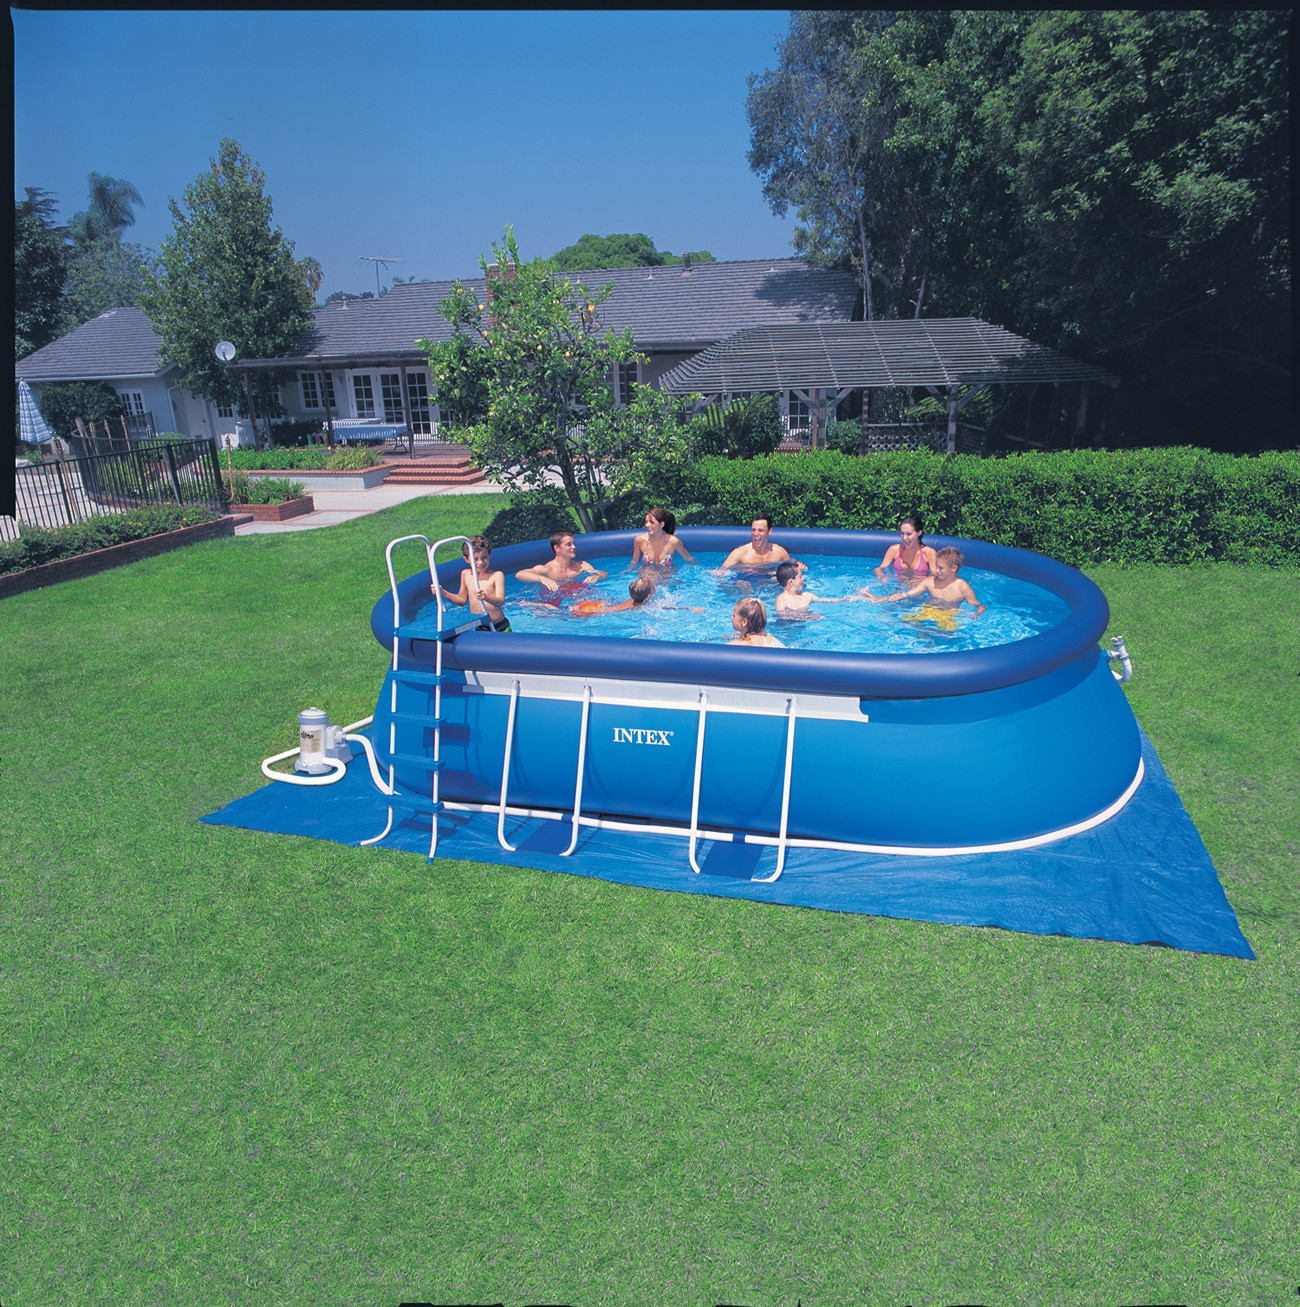 Intex Oval Frame Pool Set 610 x 366 x 122 cm